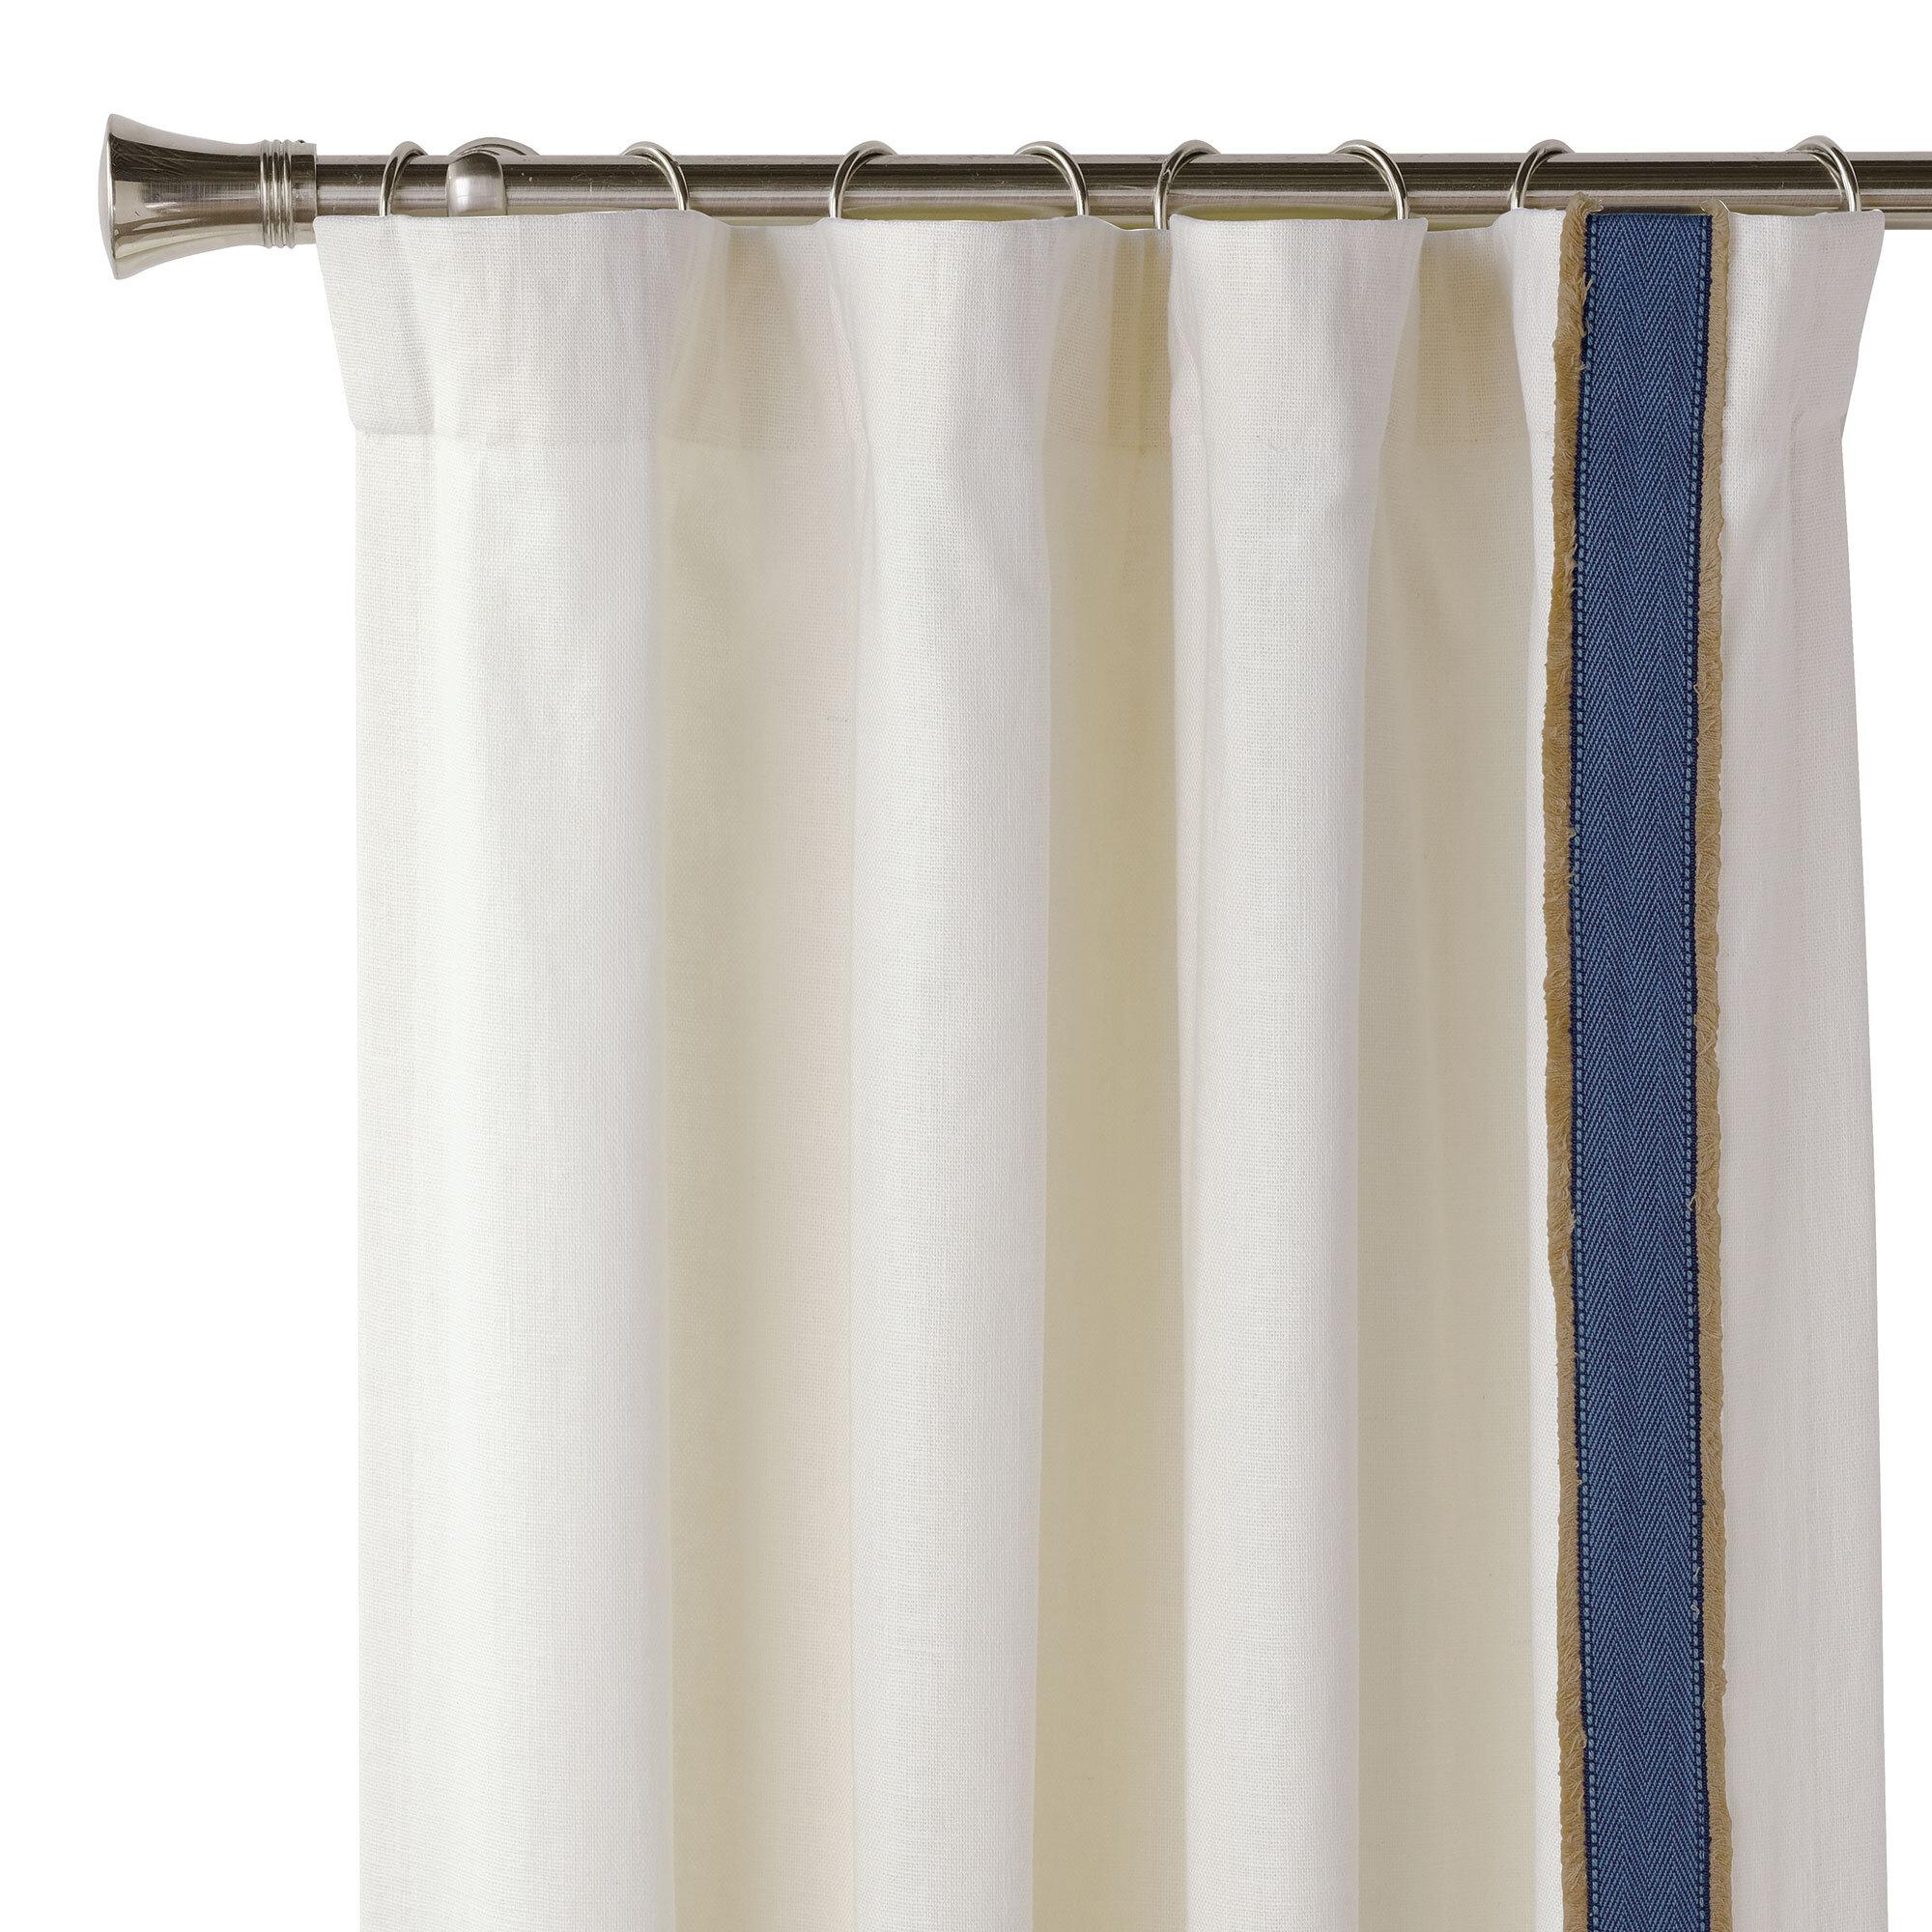 Cotton Blend Nautical Curtains Drapes You Ll Love In 2021 Wayfair